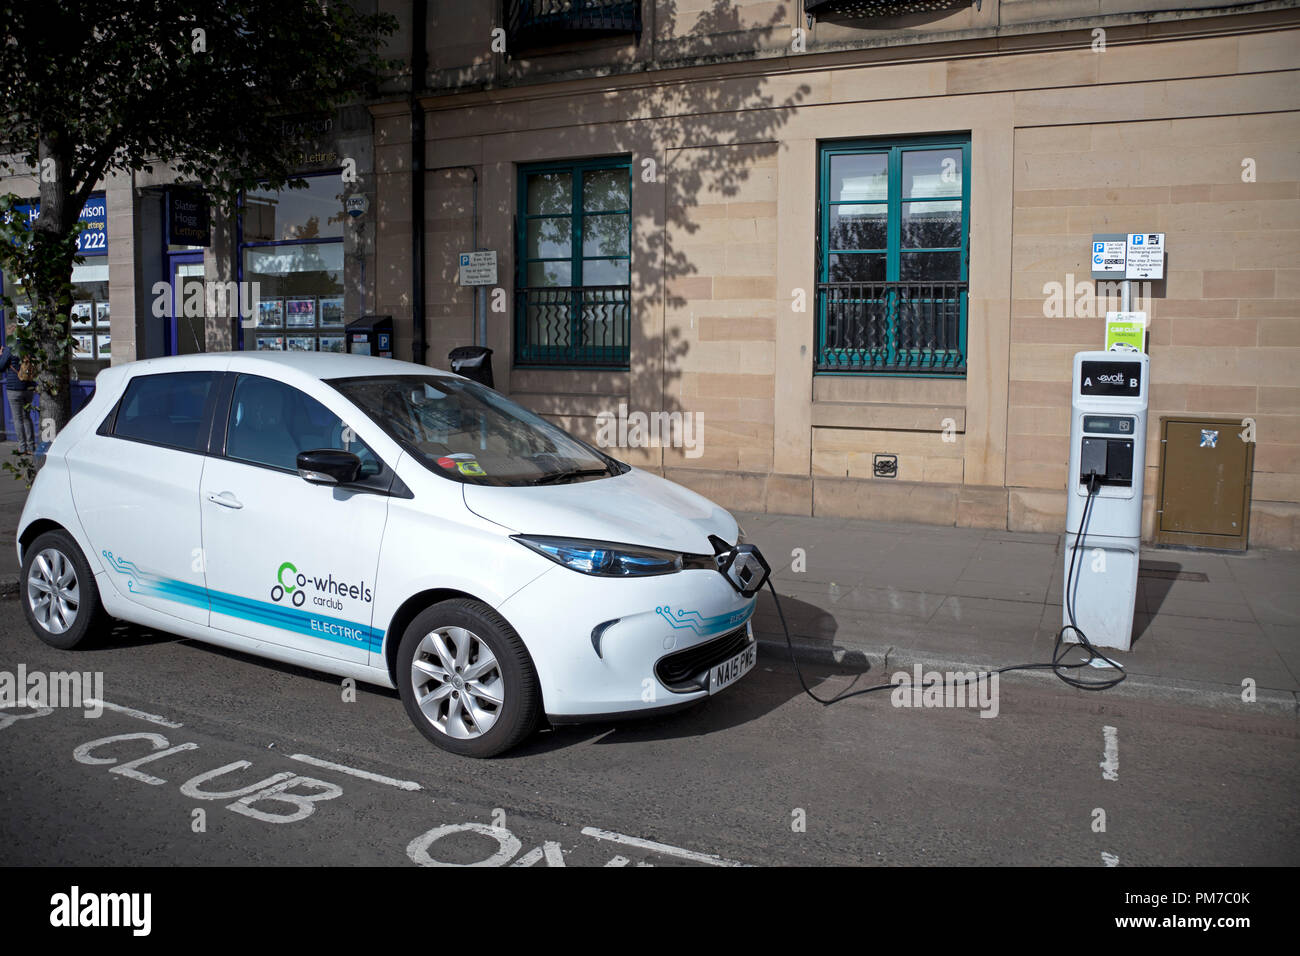 Electric car motor vehicle charging, Dundee, Scotland, UK - Stock Image